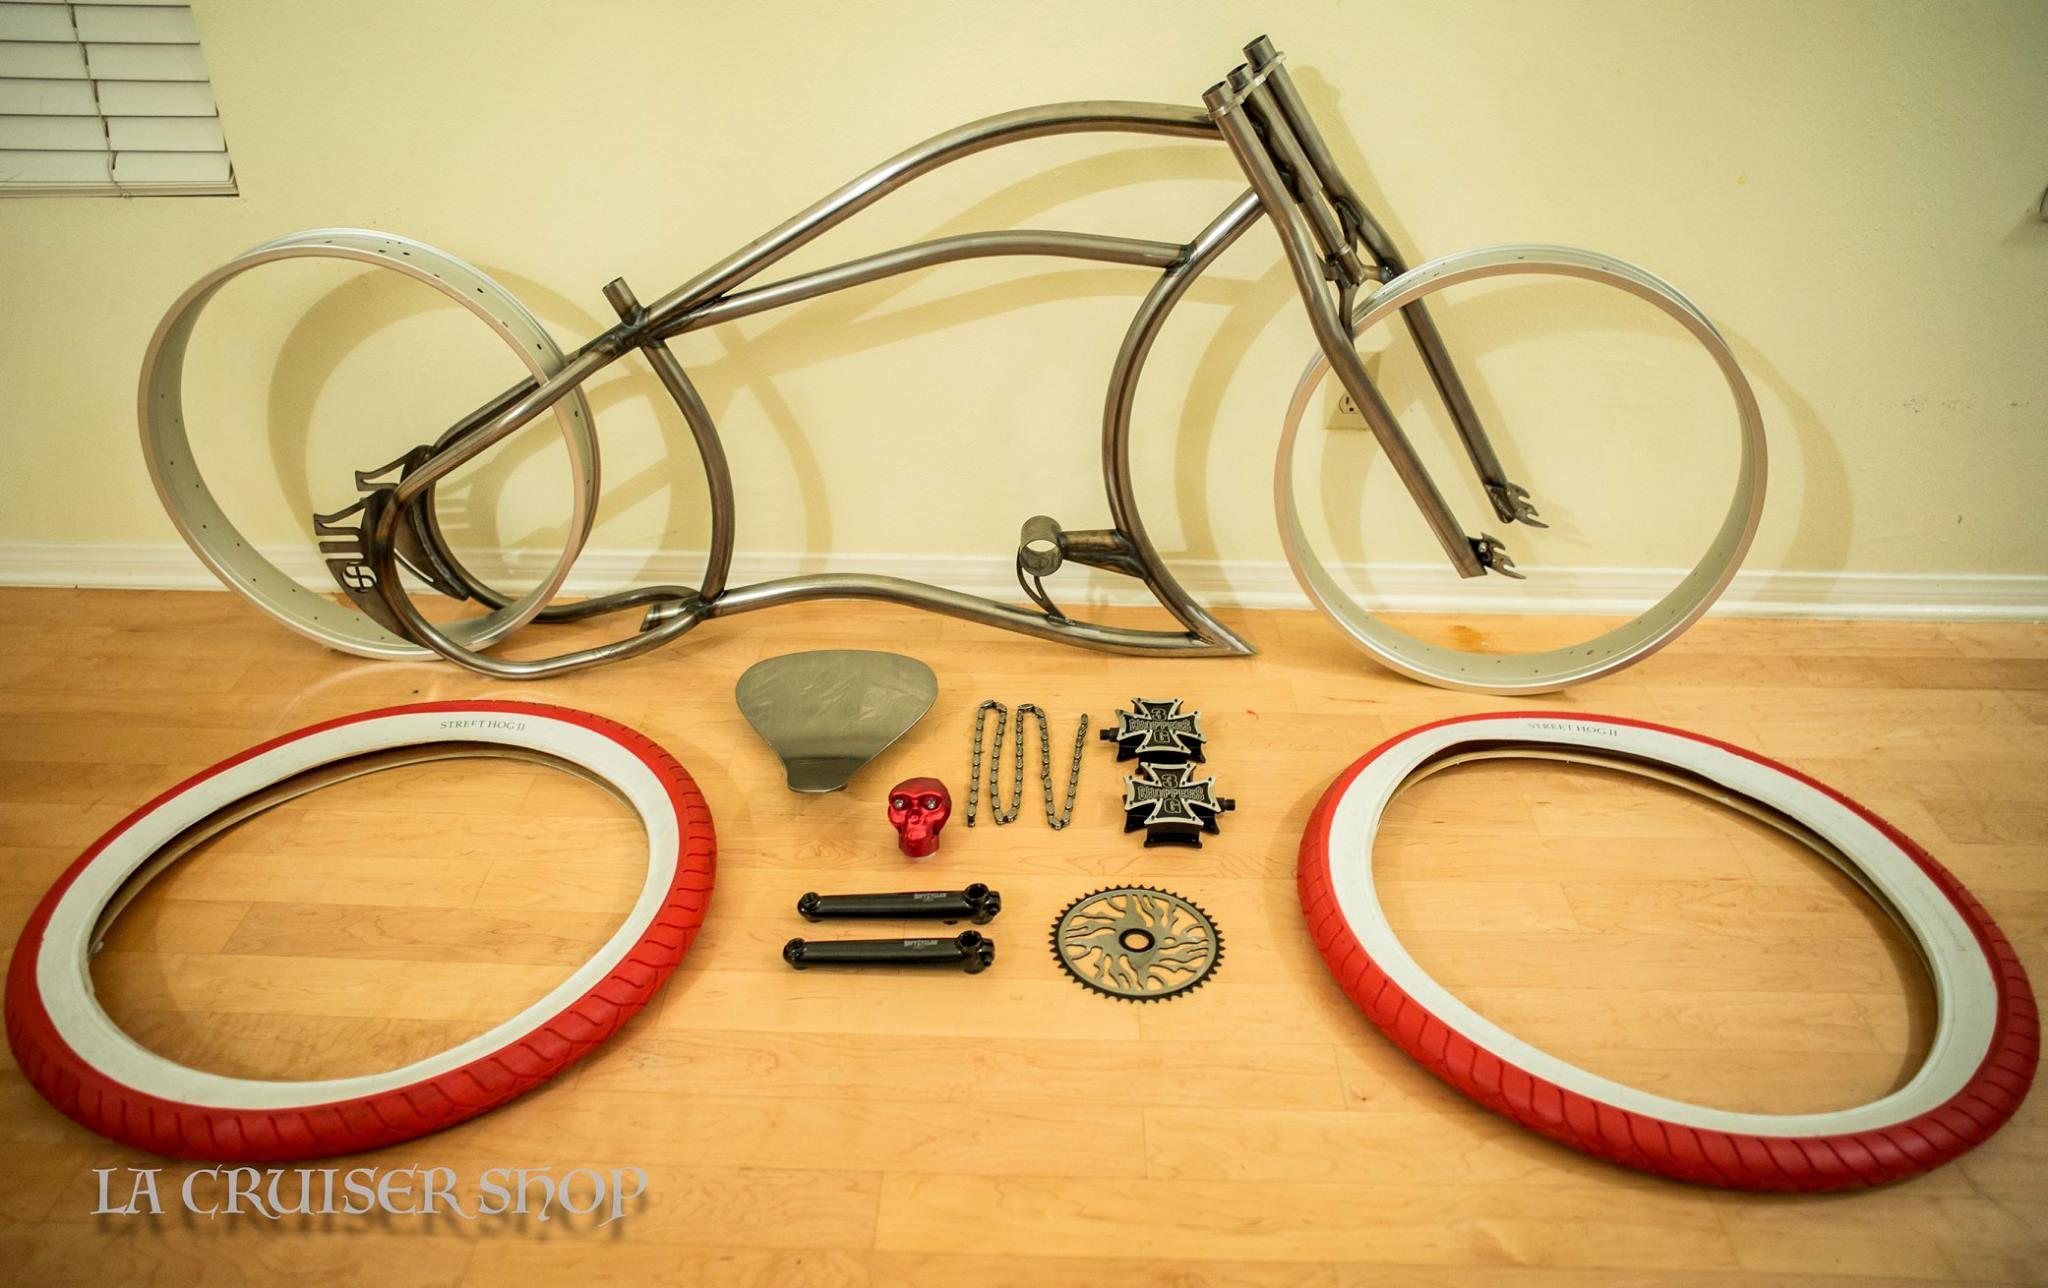 Community Bild von LA Cruiser Shop | Community Bilder | Classic Cycle